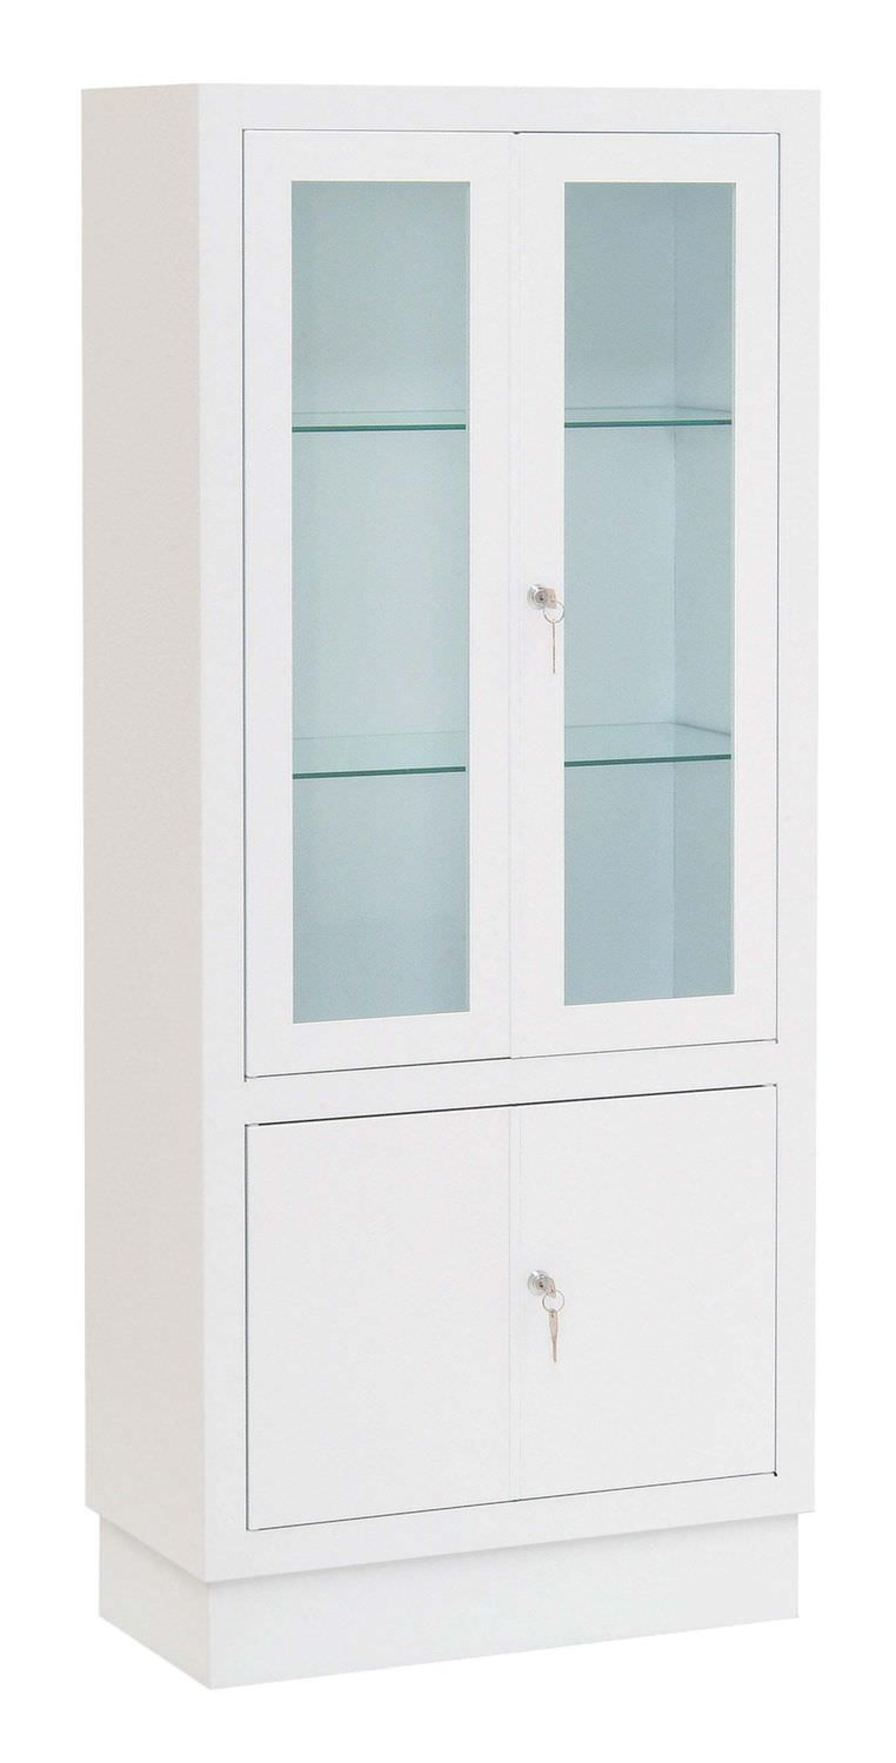 Medical instrument cabinet 24145 Inmoclinc